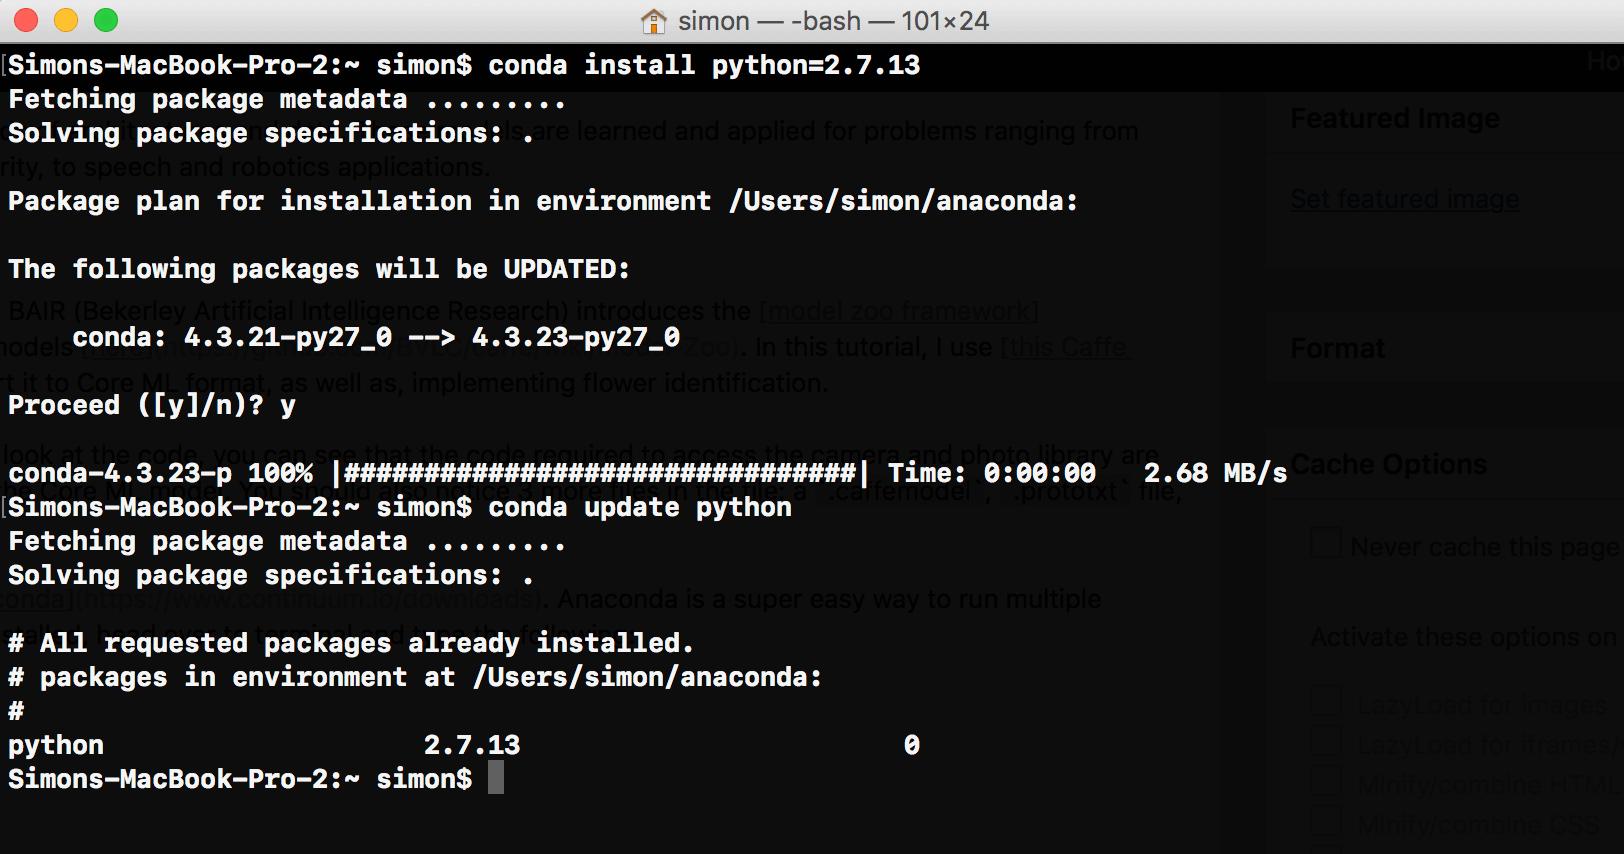 install-python-terminal